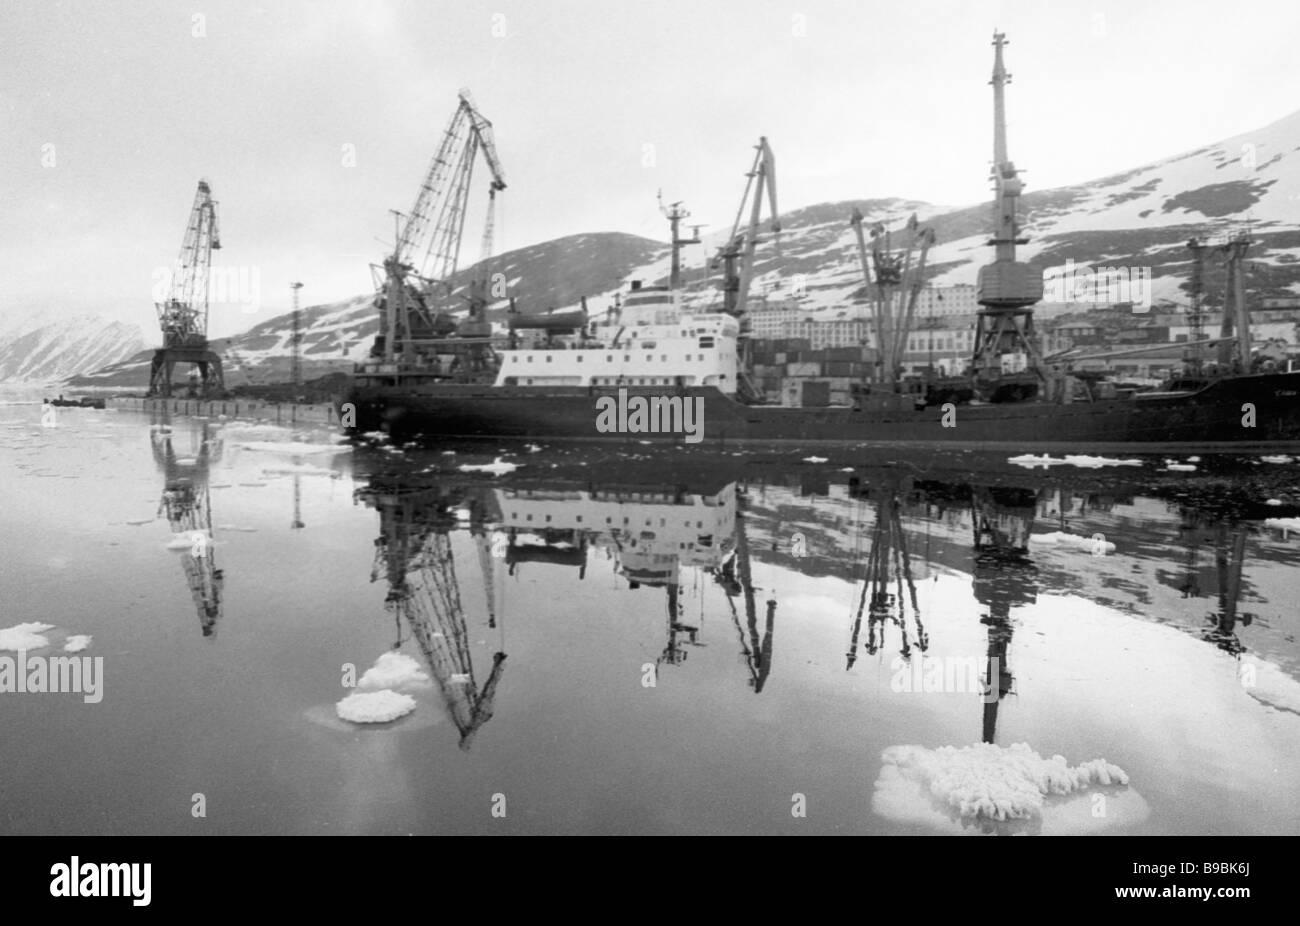 Vessels in Providence Bay - Stock Image